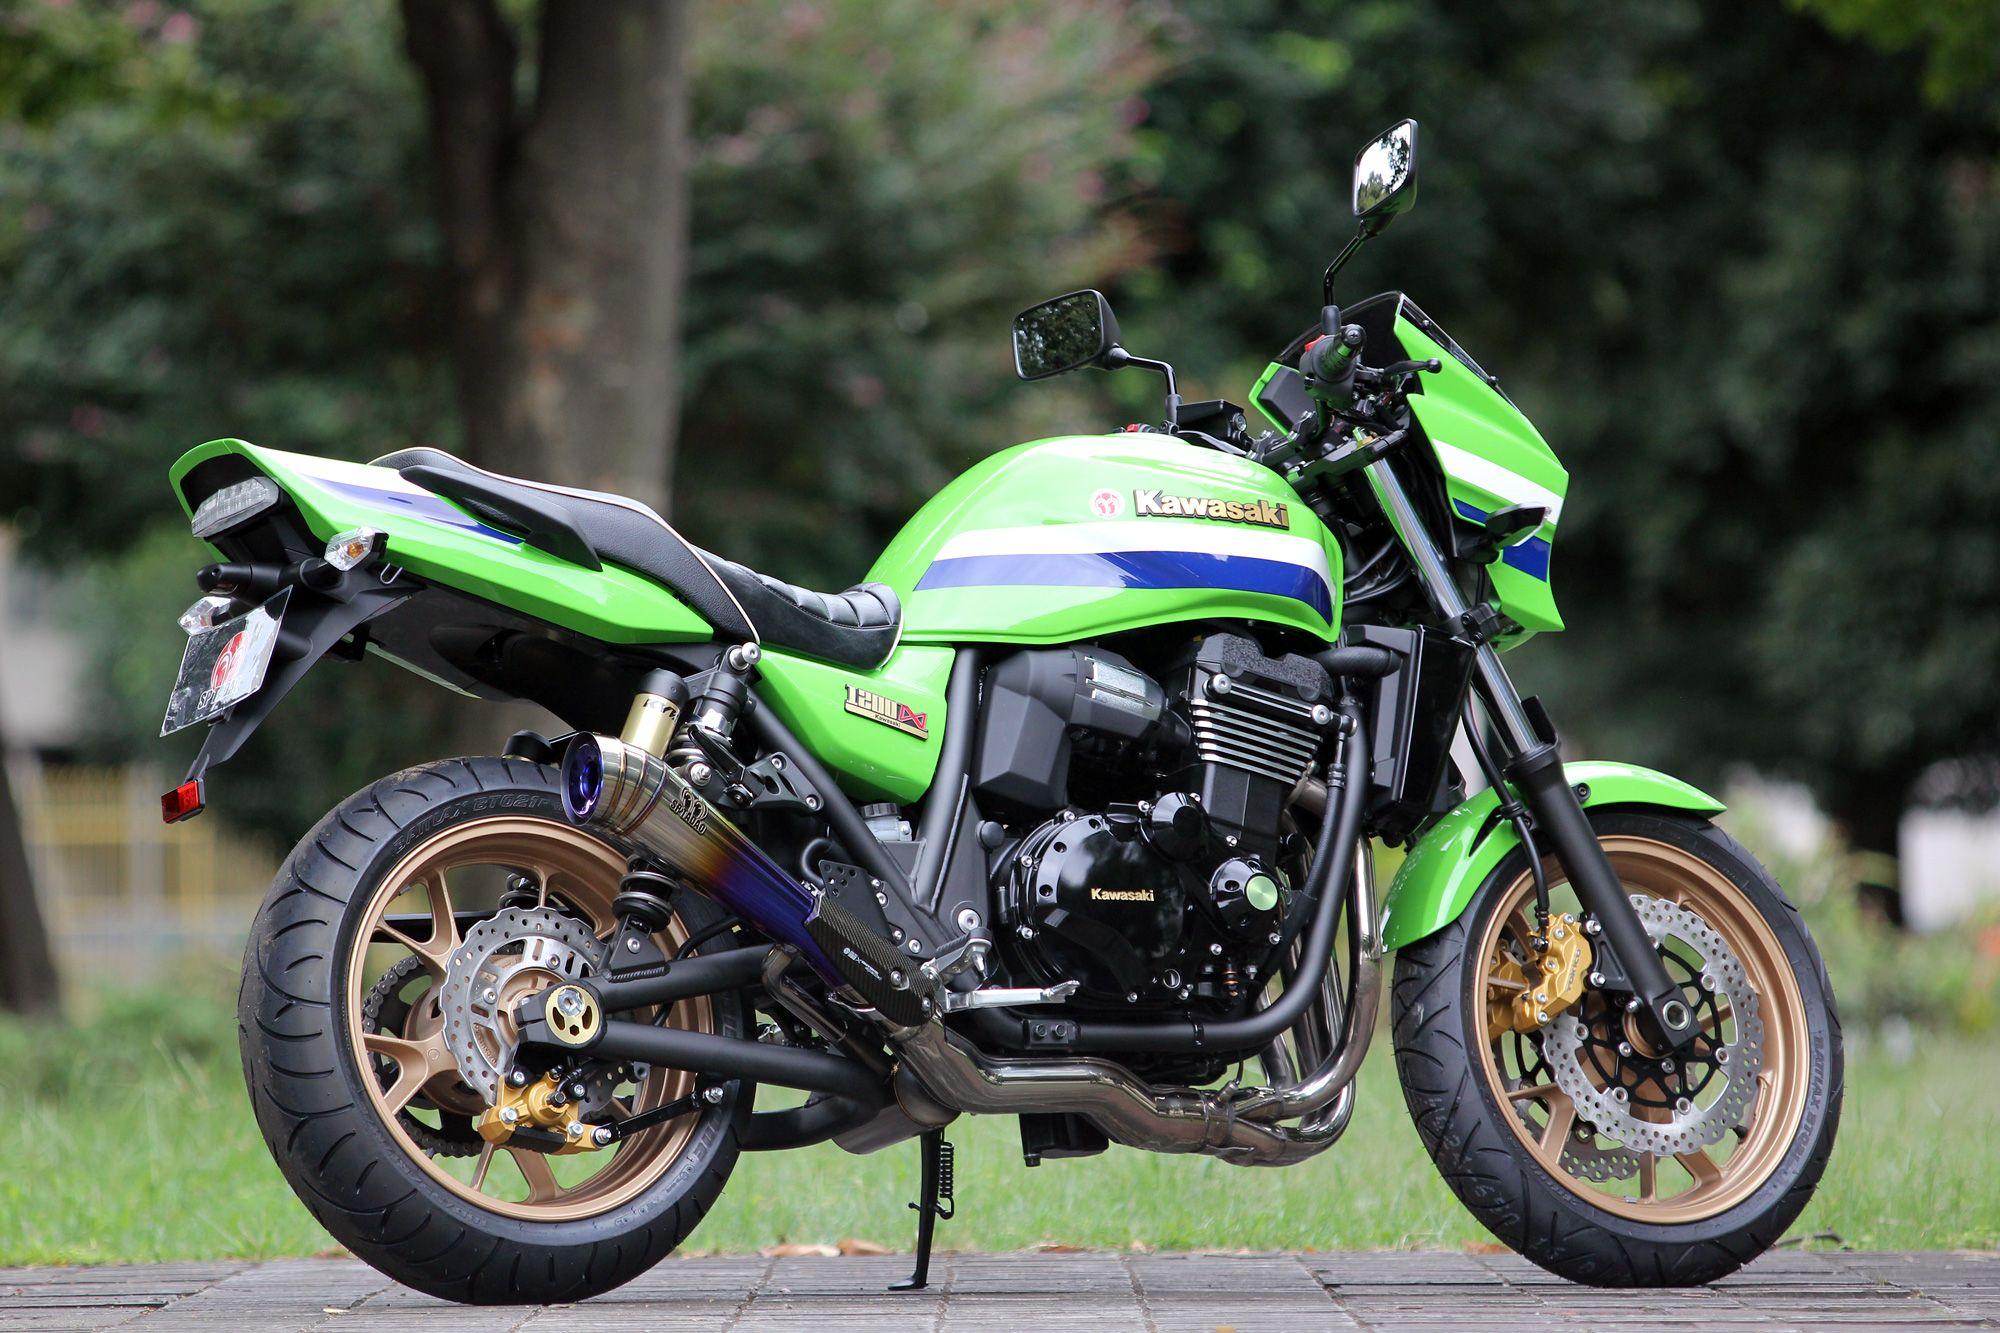 Kawasaki ZRX1200 DAEG - Japan-Only